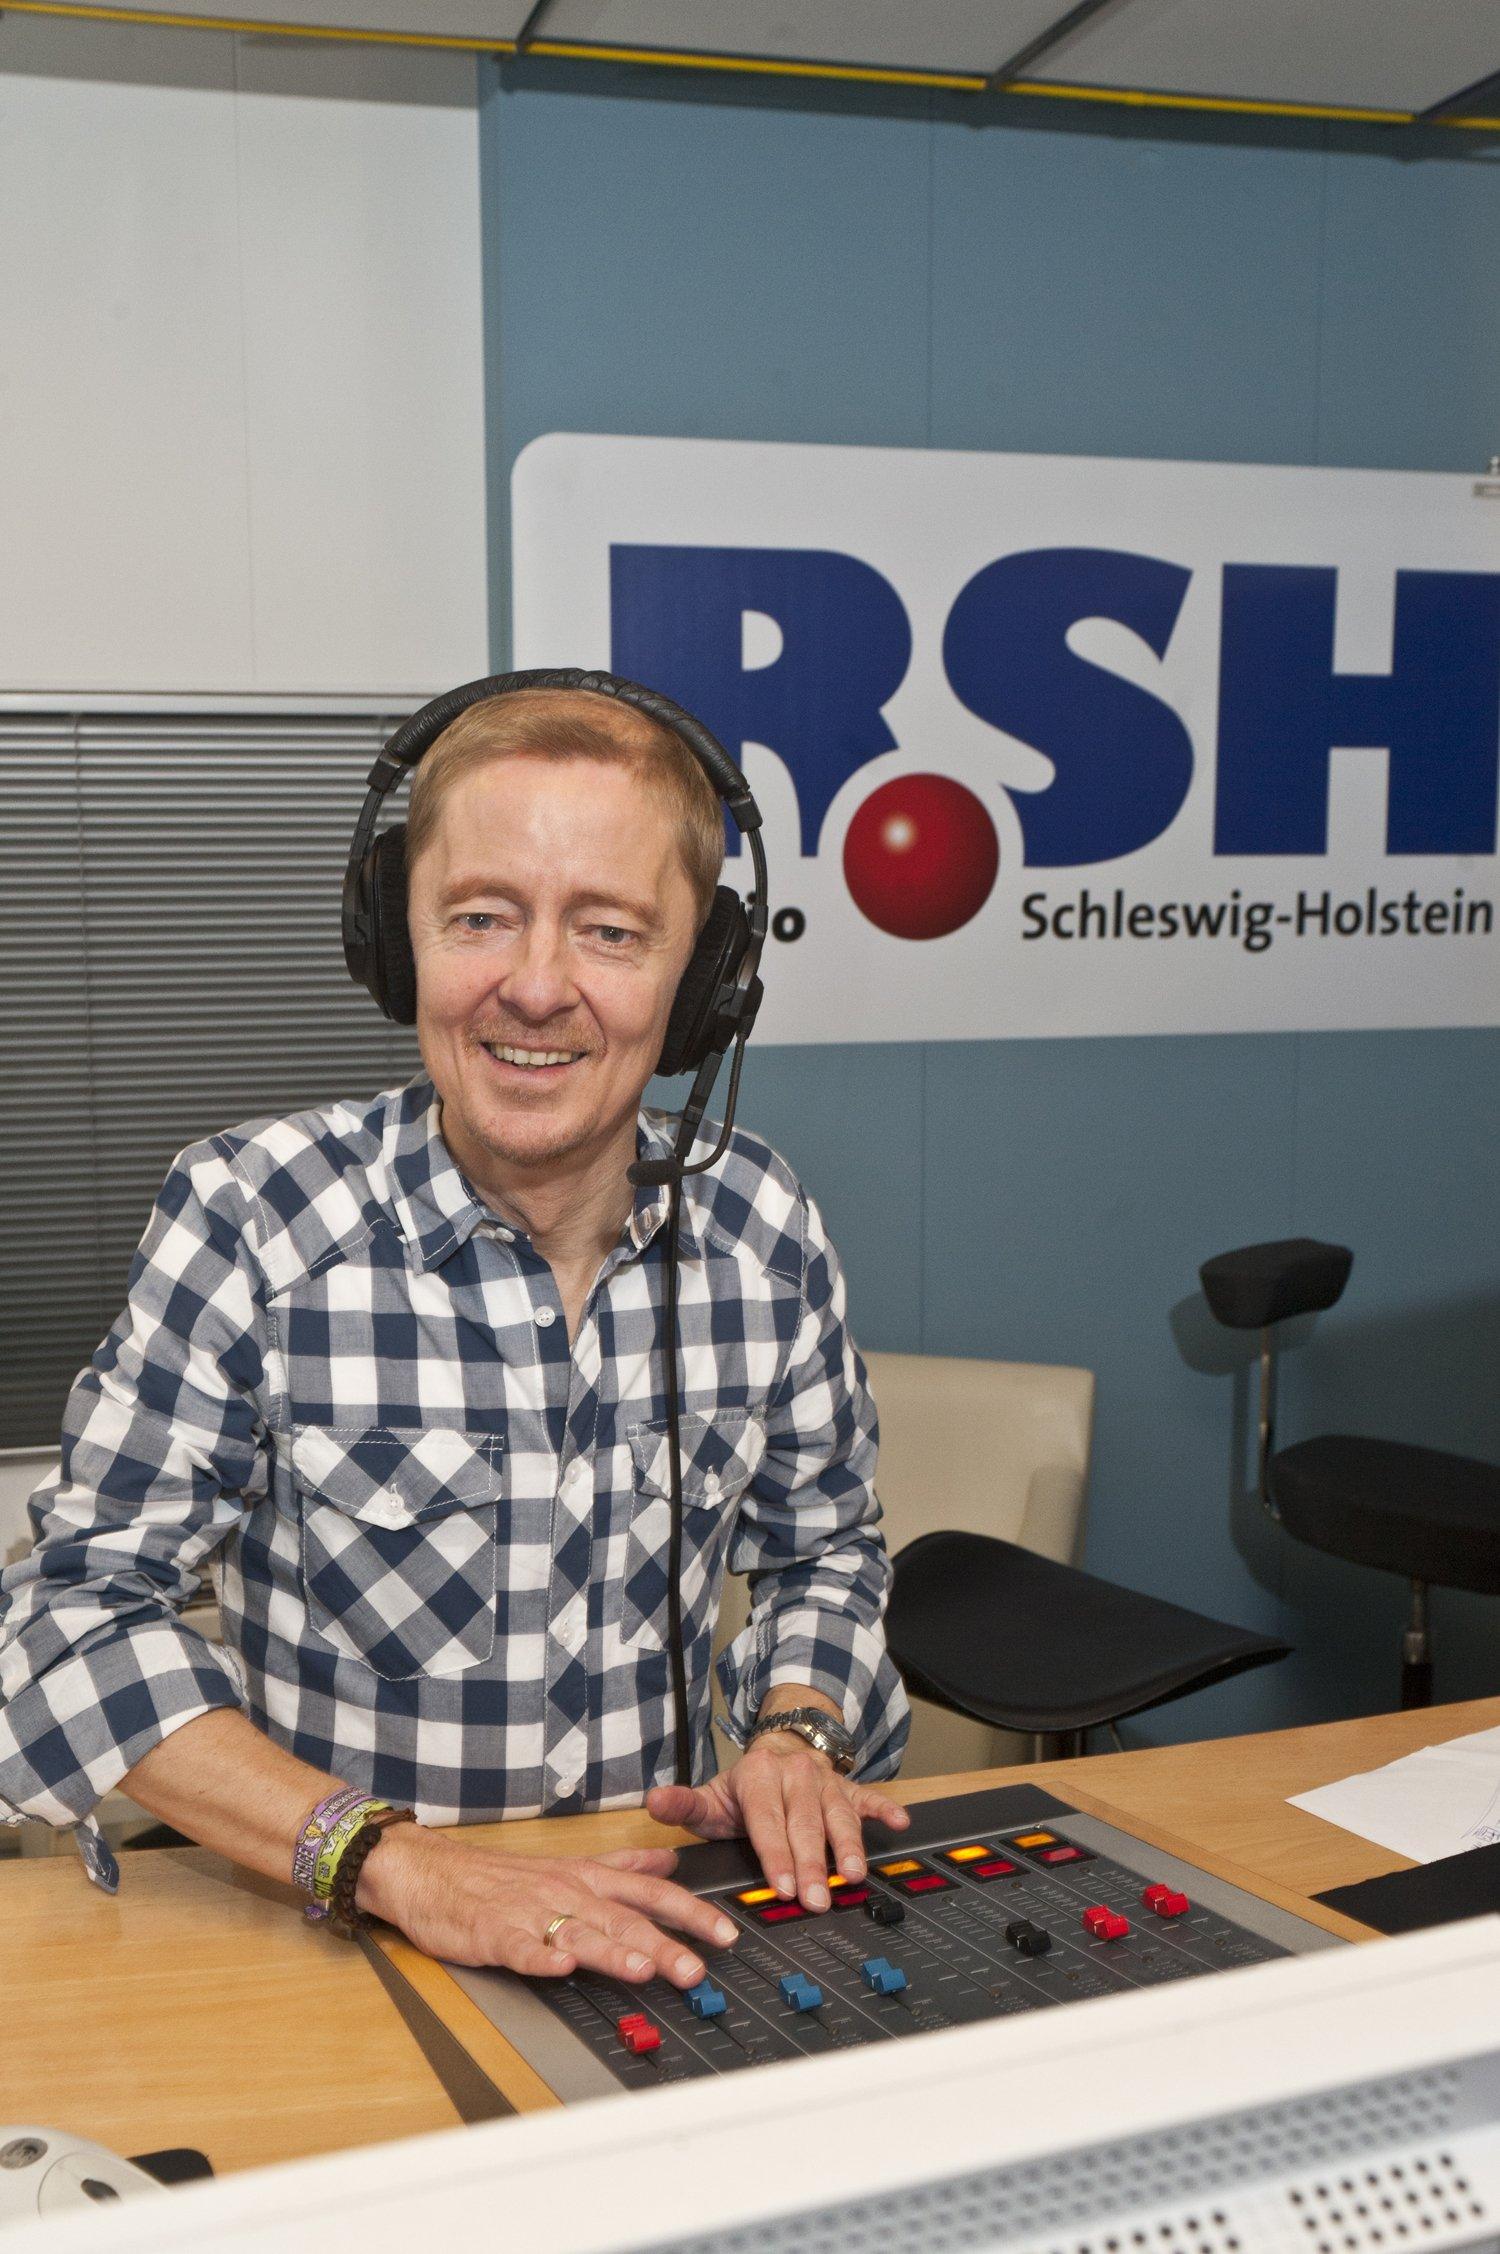 Carsten Köthe im R.SH-Studio (Bild: R.SH)